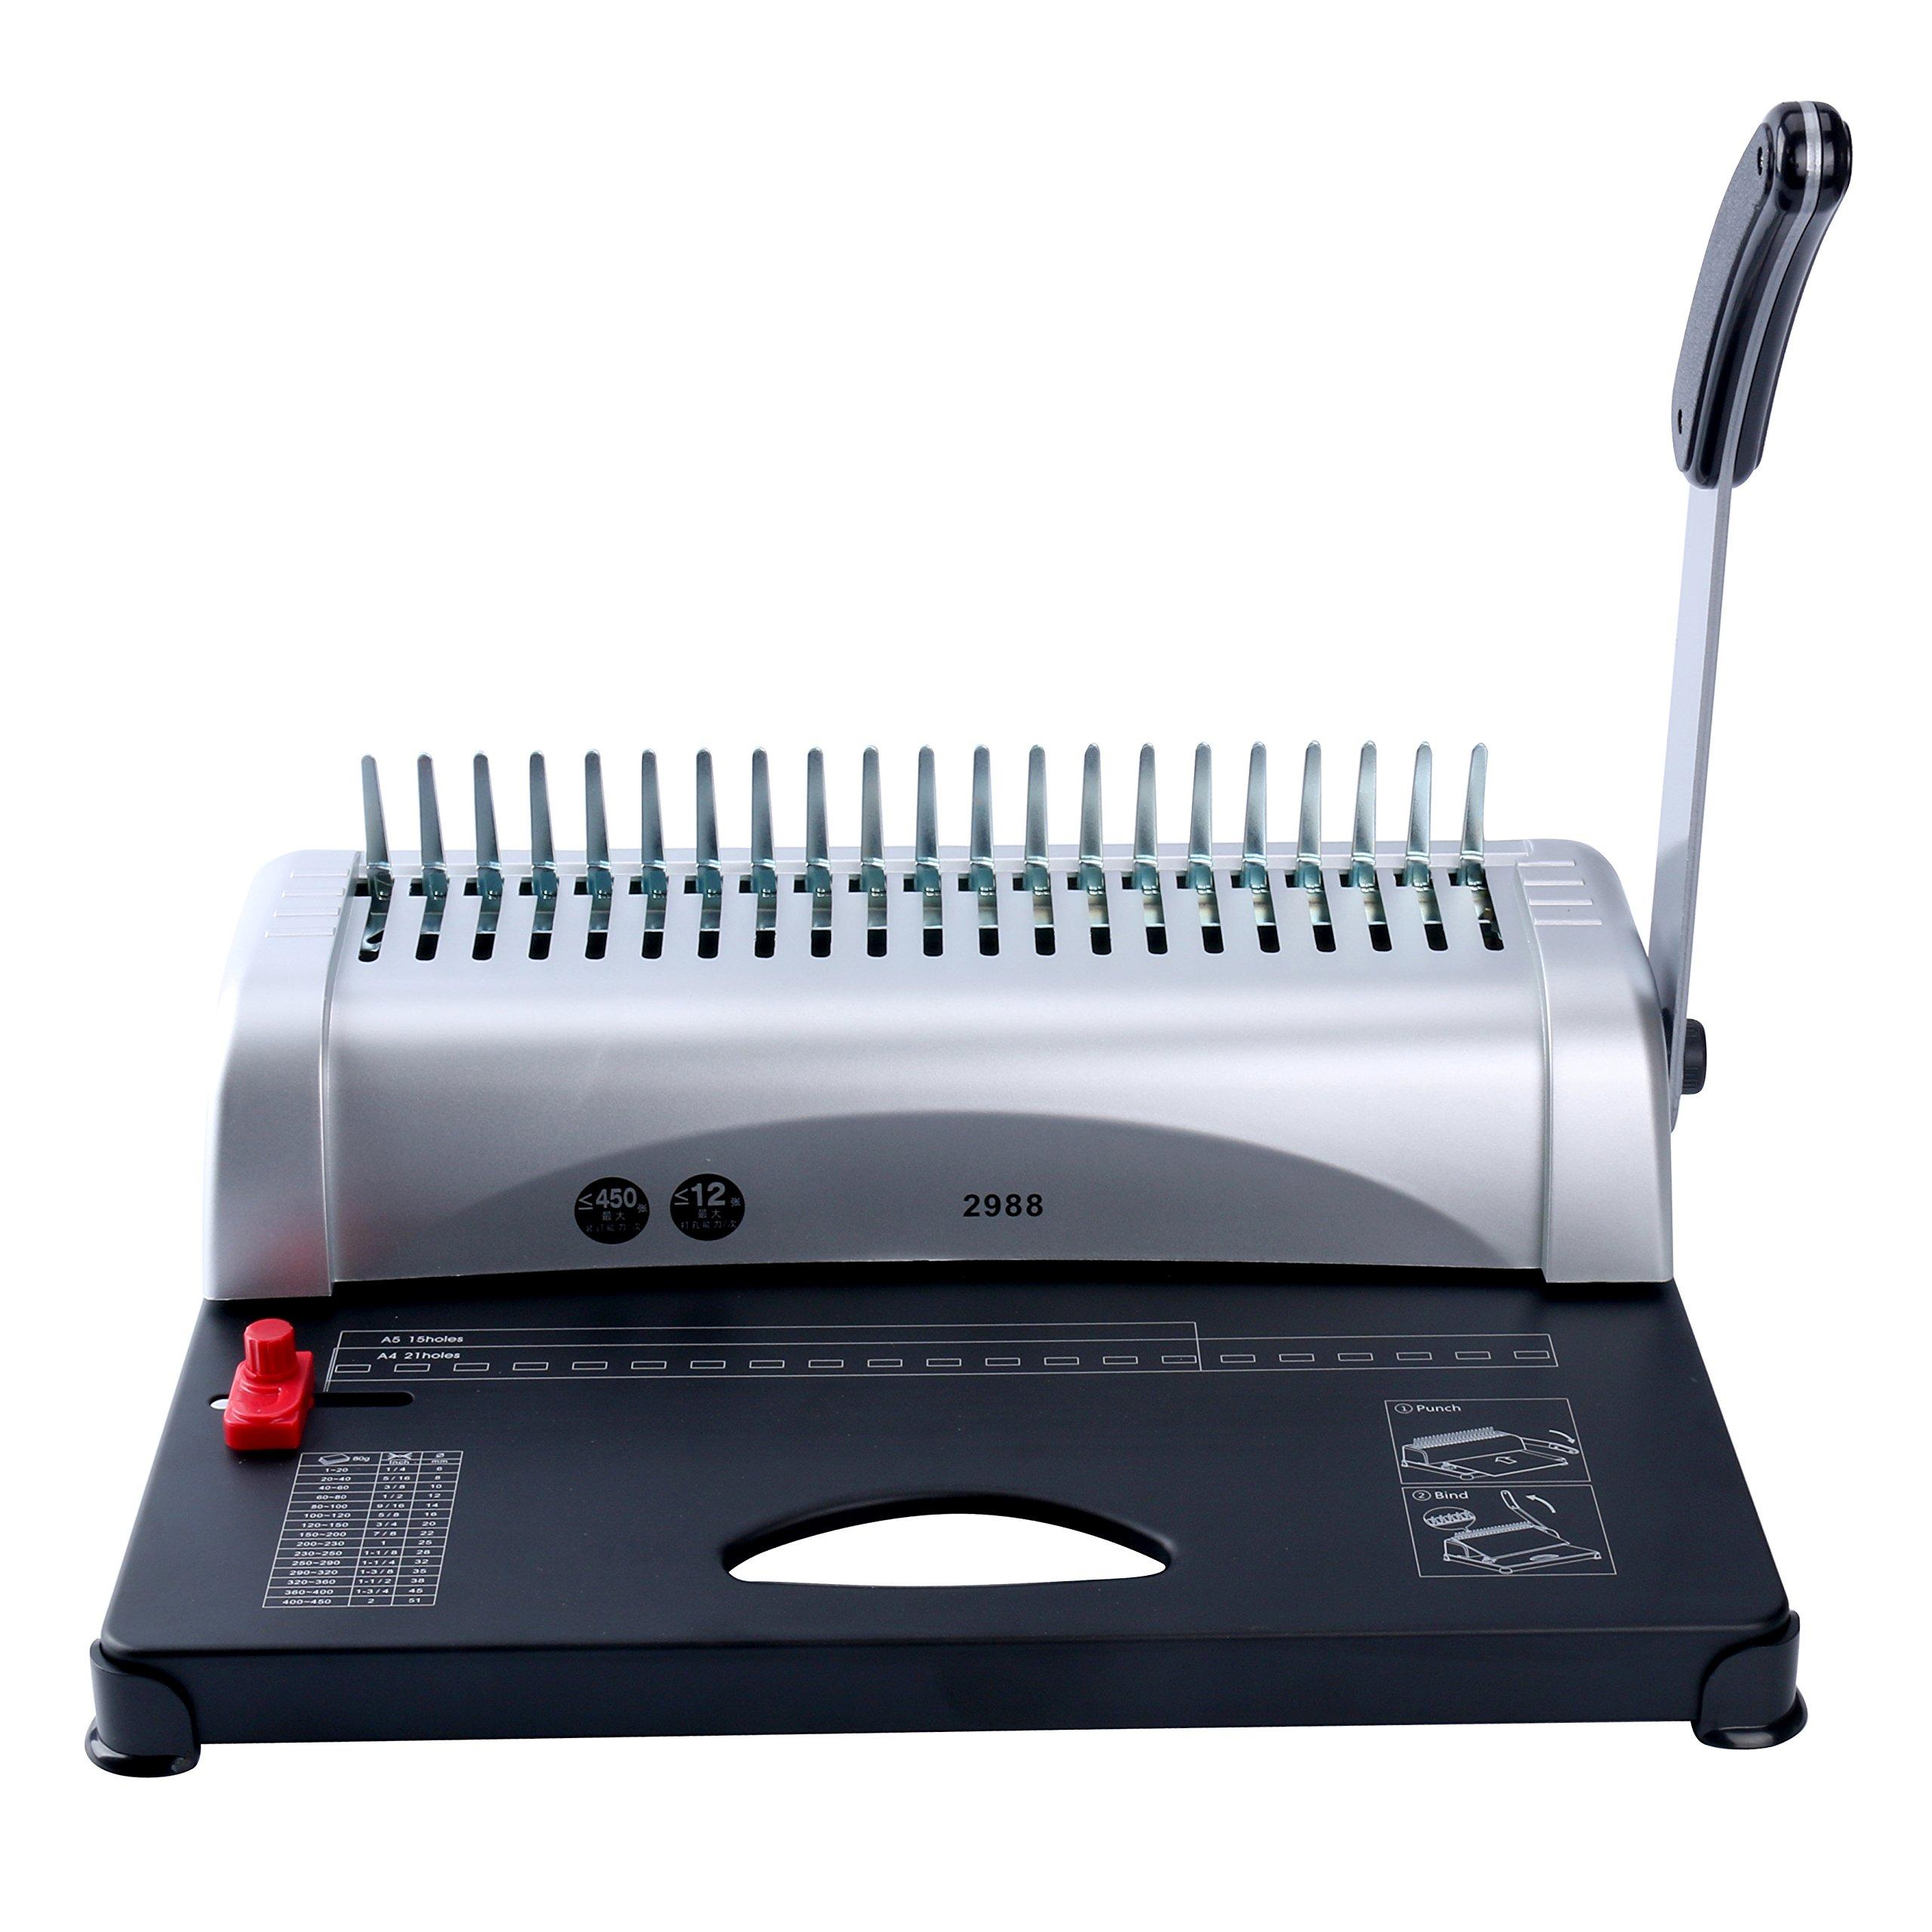 YaeKoo 21-Hole 450 Sheets Paper Comb Punch Binder Binding Machine Scrapbook